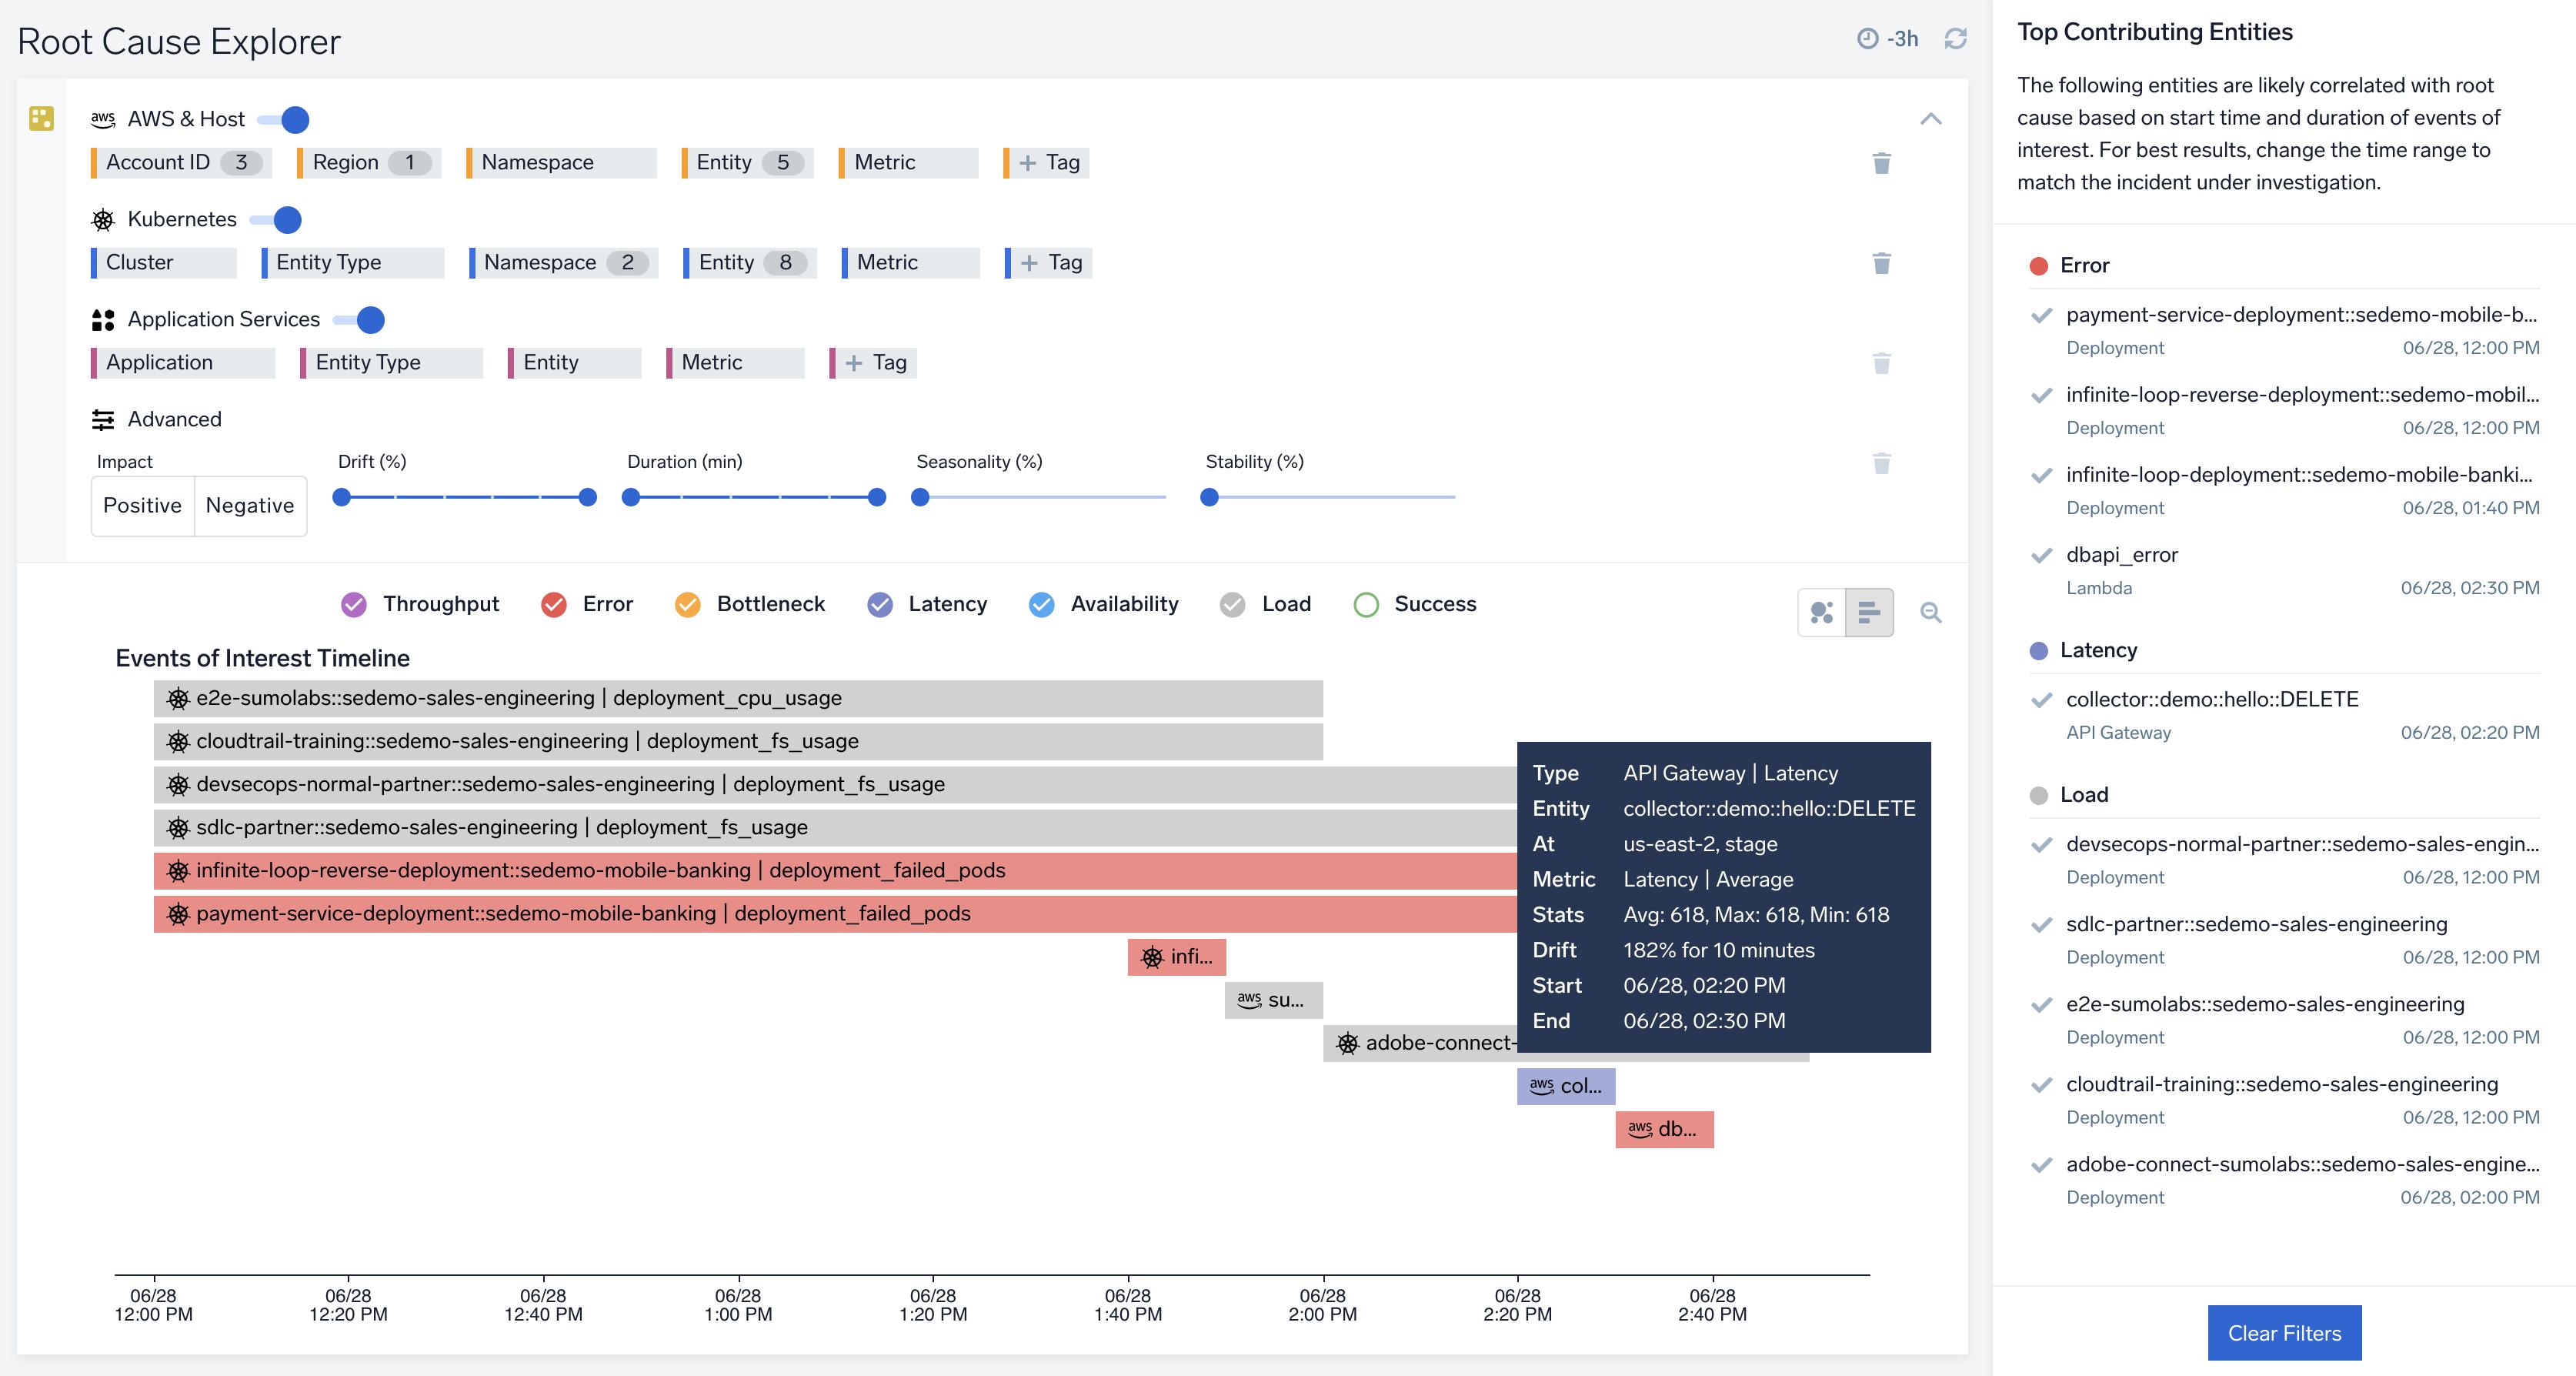 Root Cause Explorer Improvements